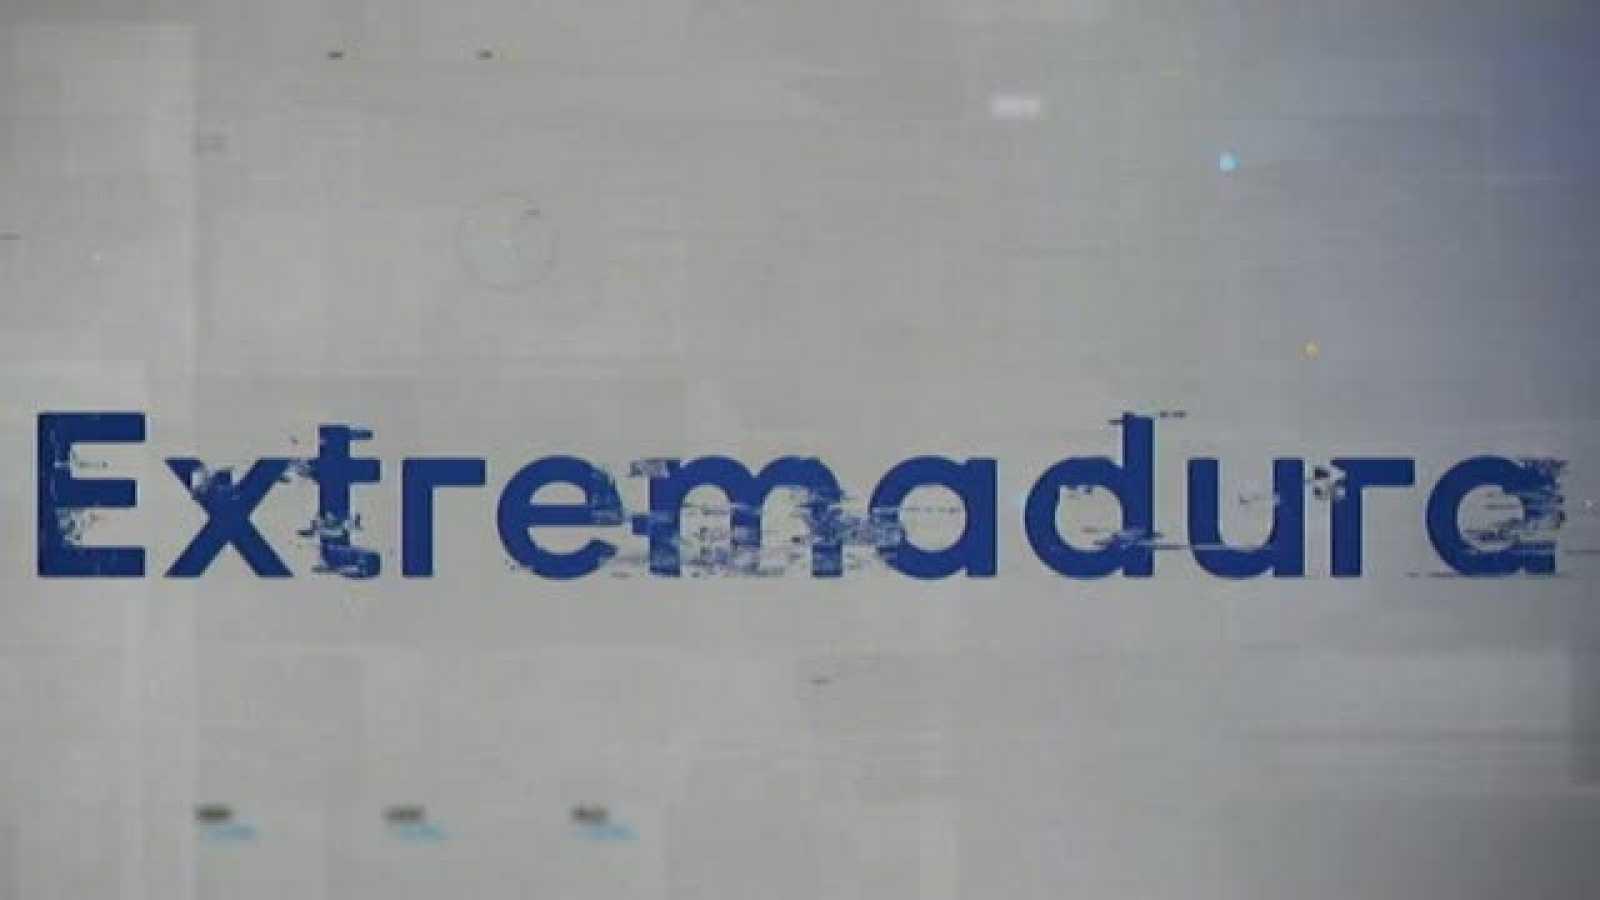 Noticias de Extremadura 2 - 29/04/2021